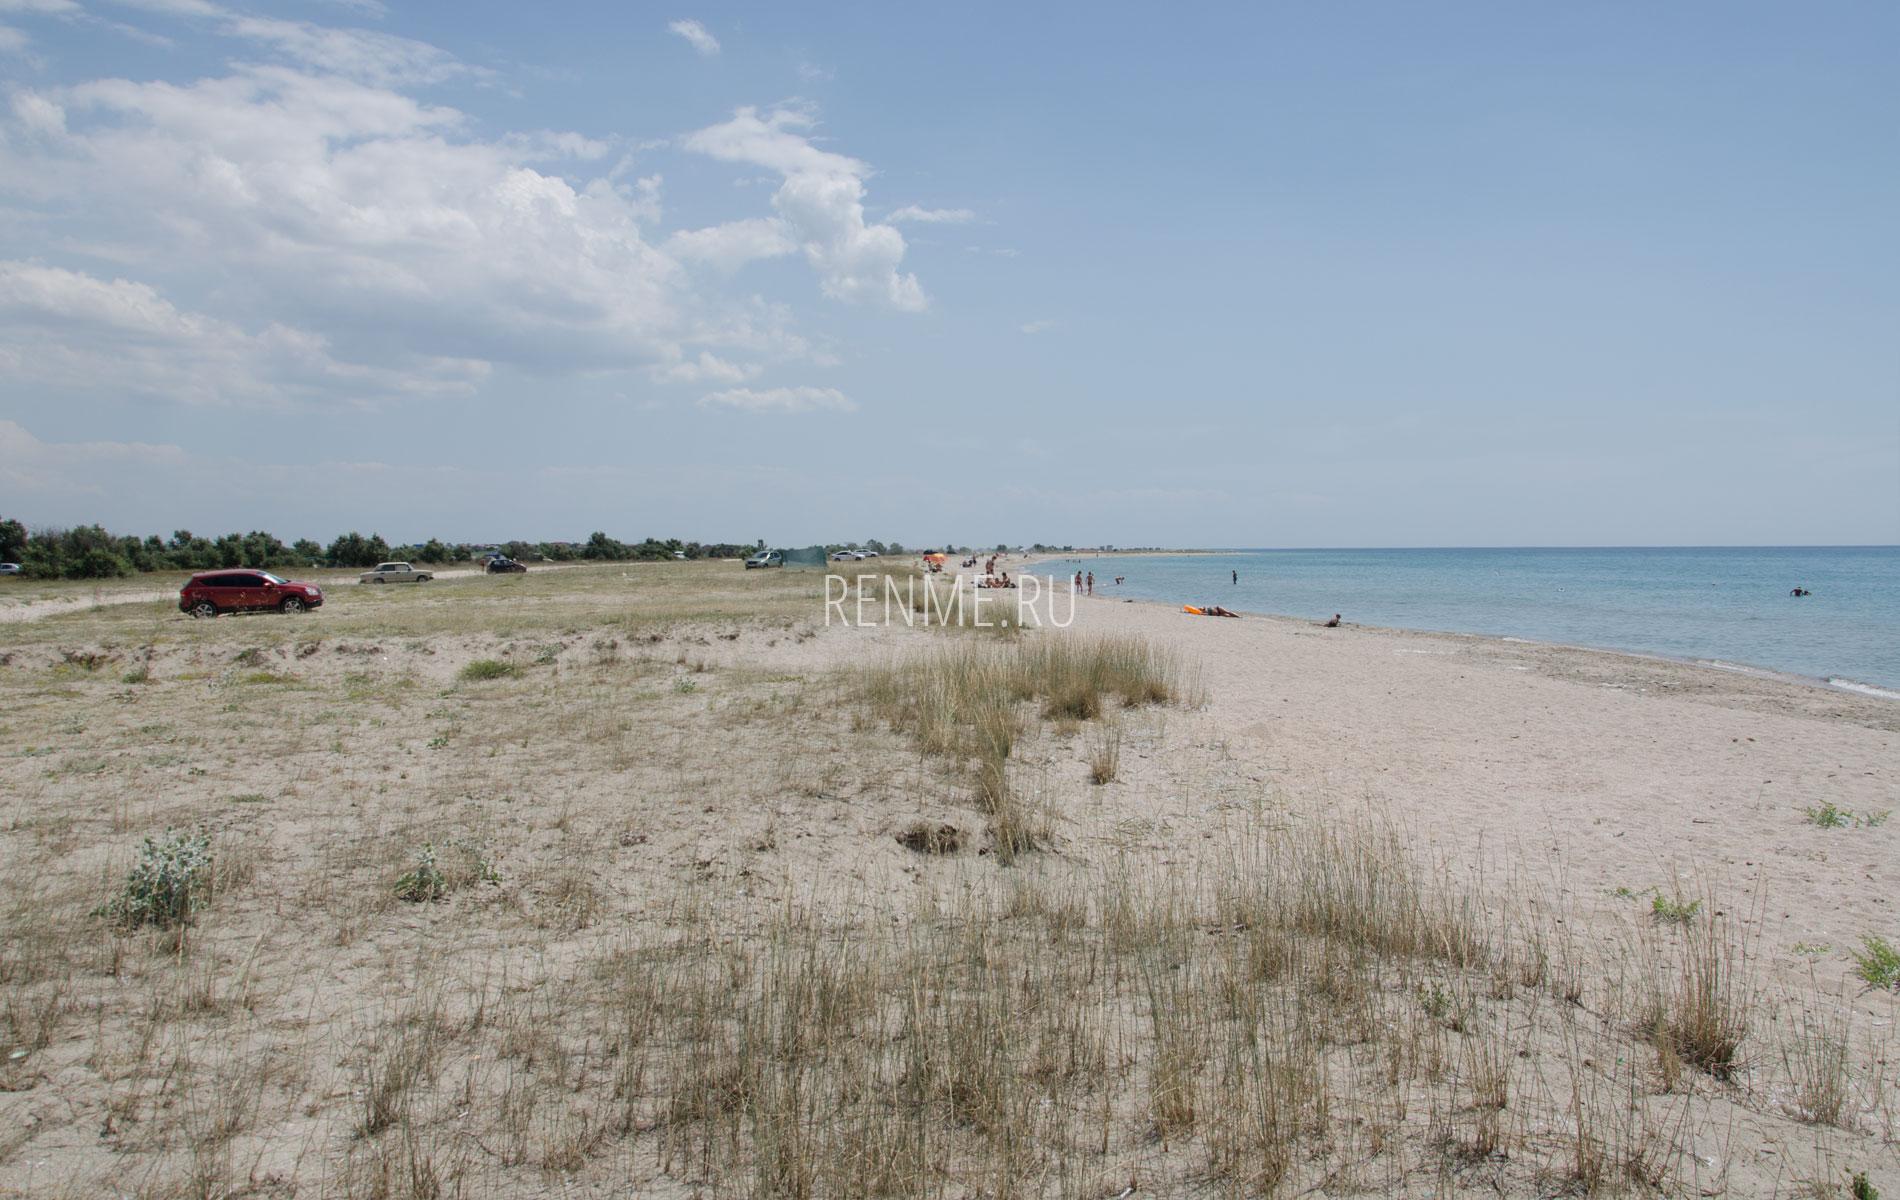 Лучший дикий пляж побережья. Фото Штормового